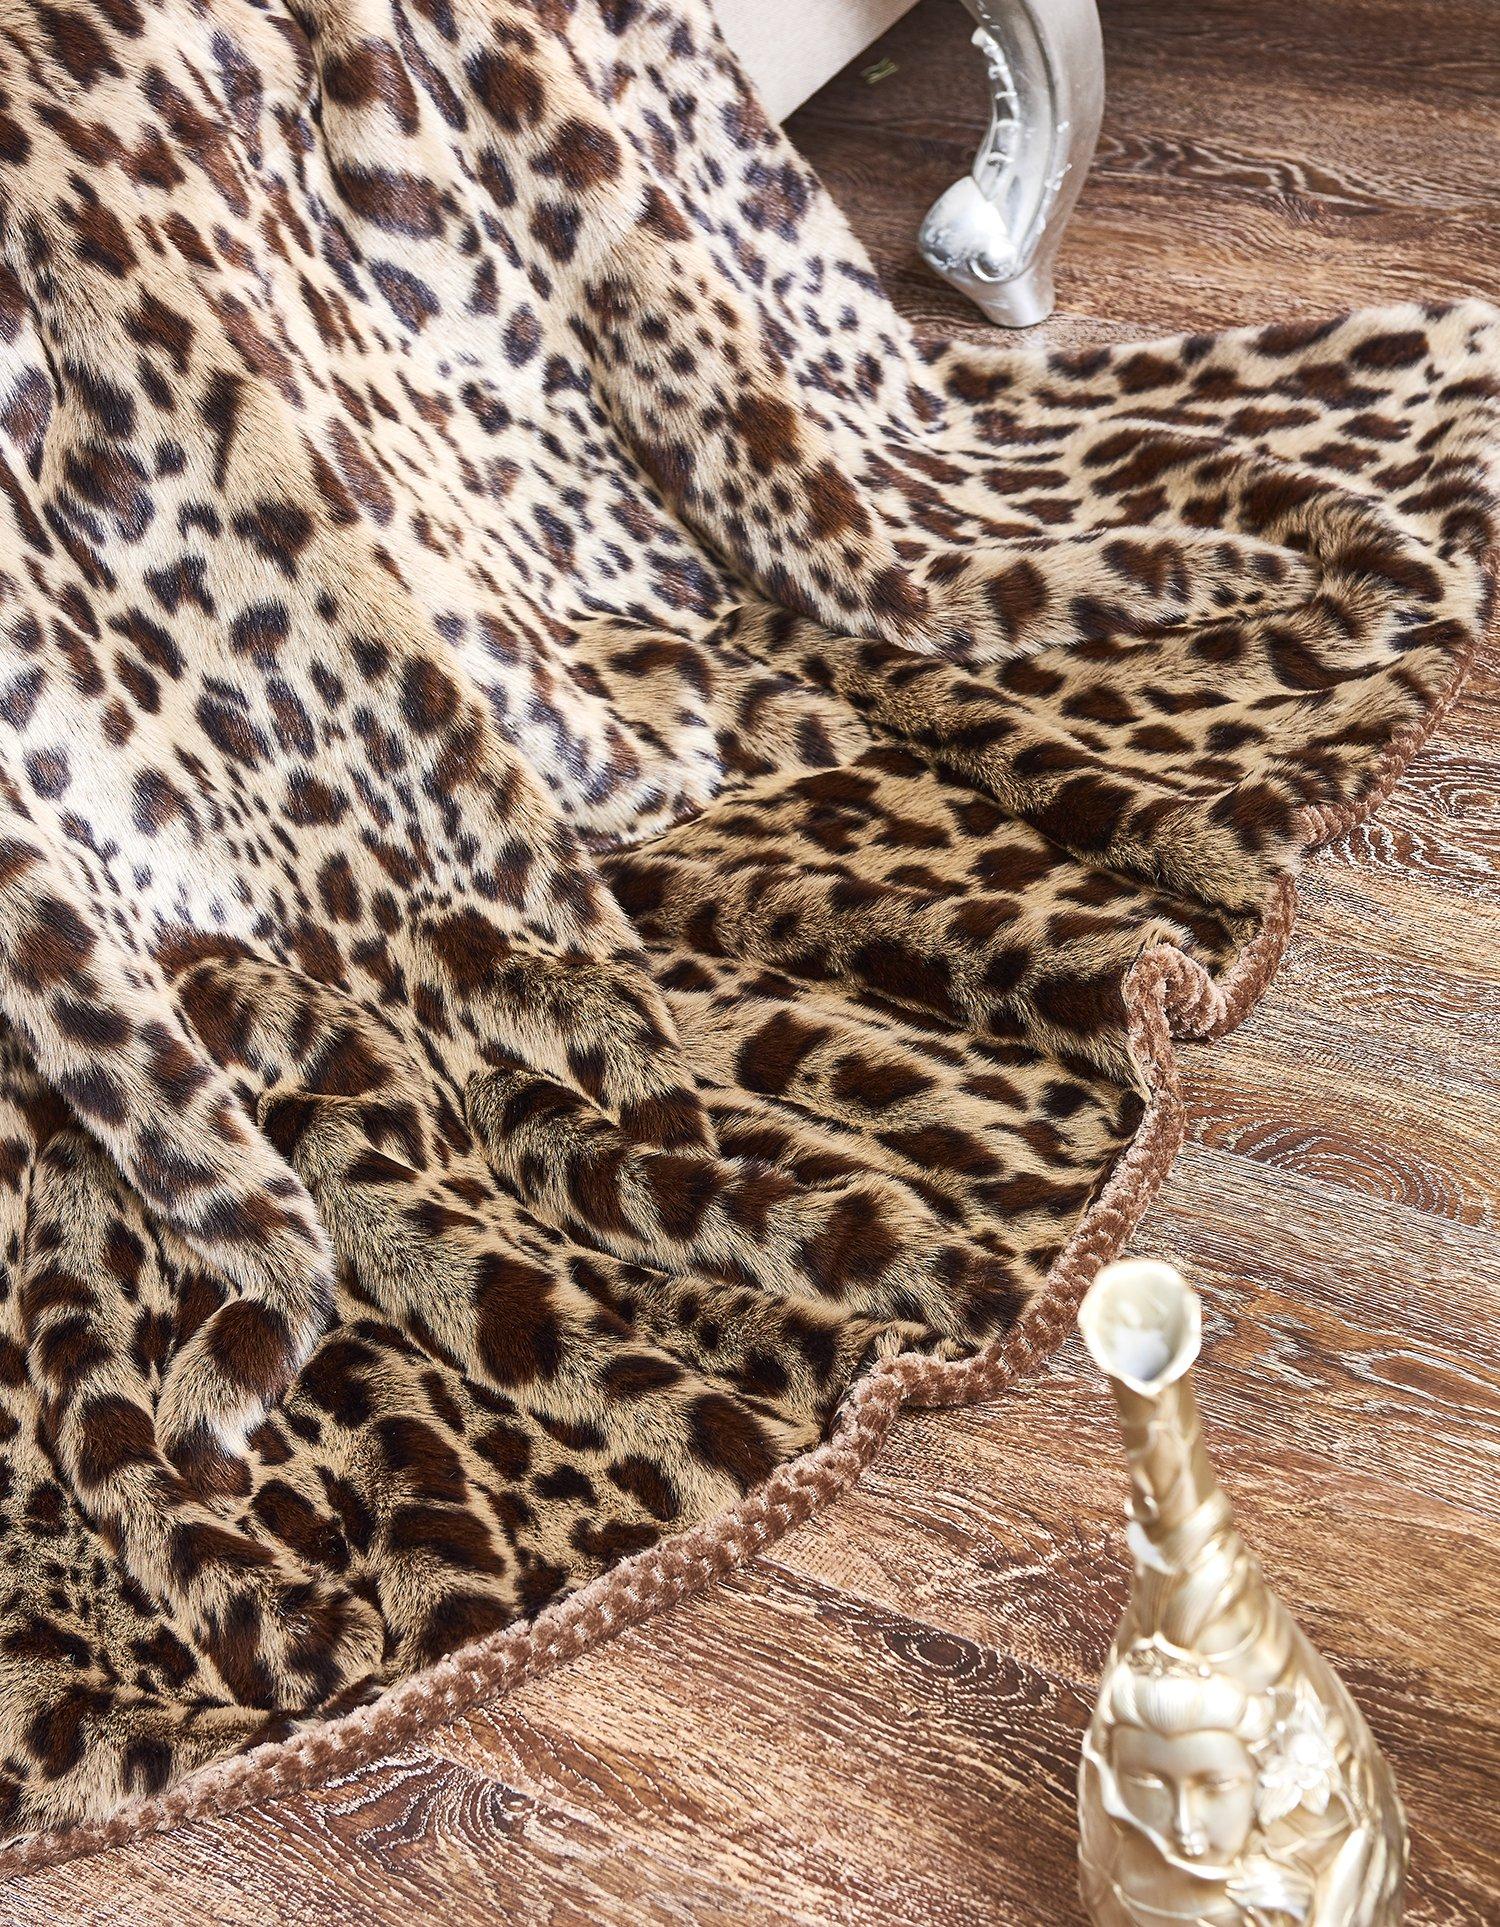 Lindsey Home Fashion Faux Fur Throw, Fur Blankets Super Soft Japanese Kanekalon Fiber, Sheepskin, Mink, Wolf, Bear, 60''x80'', 60''x70'', 50''x60'' 14 Colors (60x70(INCH), Dark Leopard) by Lindsey Home Fashion (Image #5)